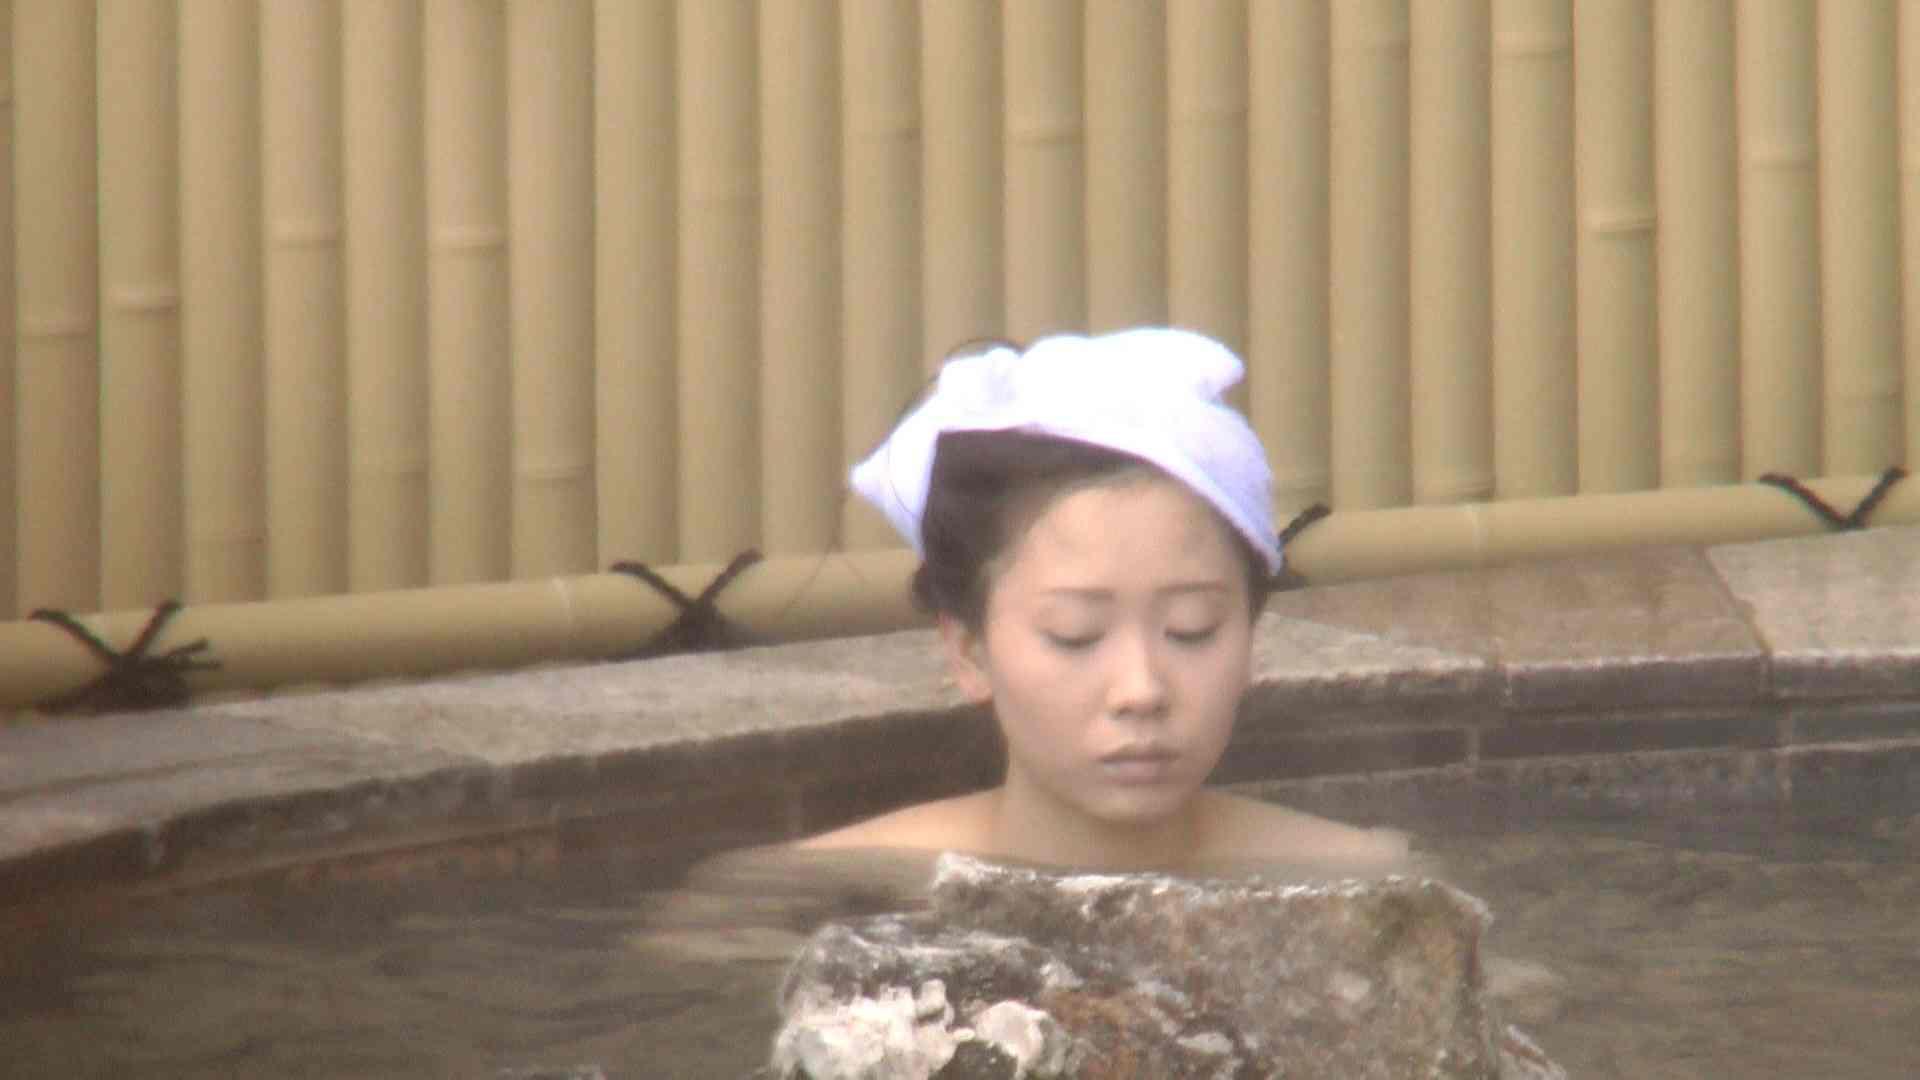 Aquaな露天風呂Vol.211 盗撮シリーズ   露天風呂編  76PIX 9